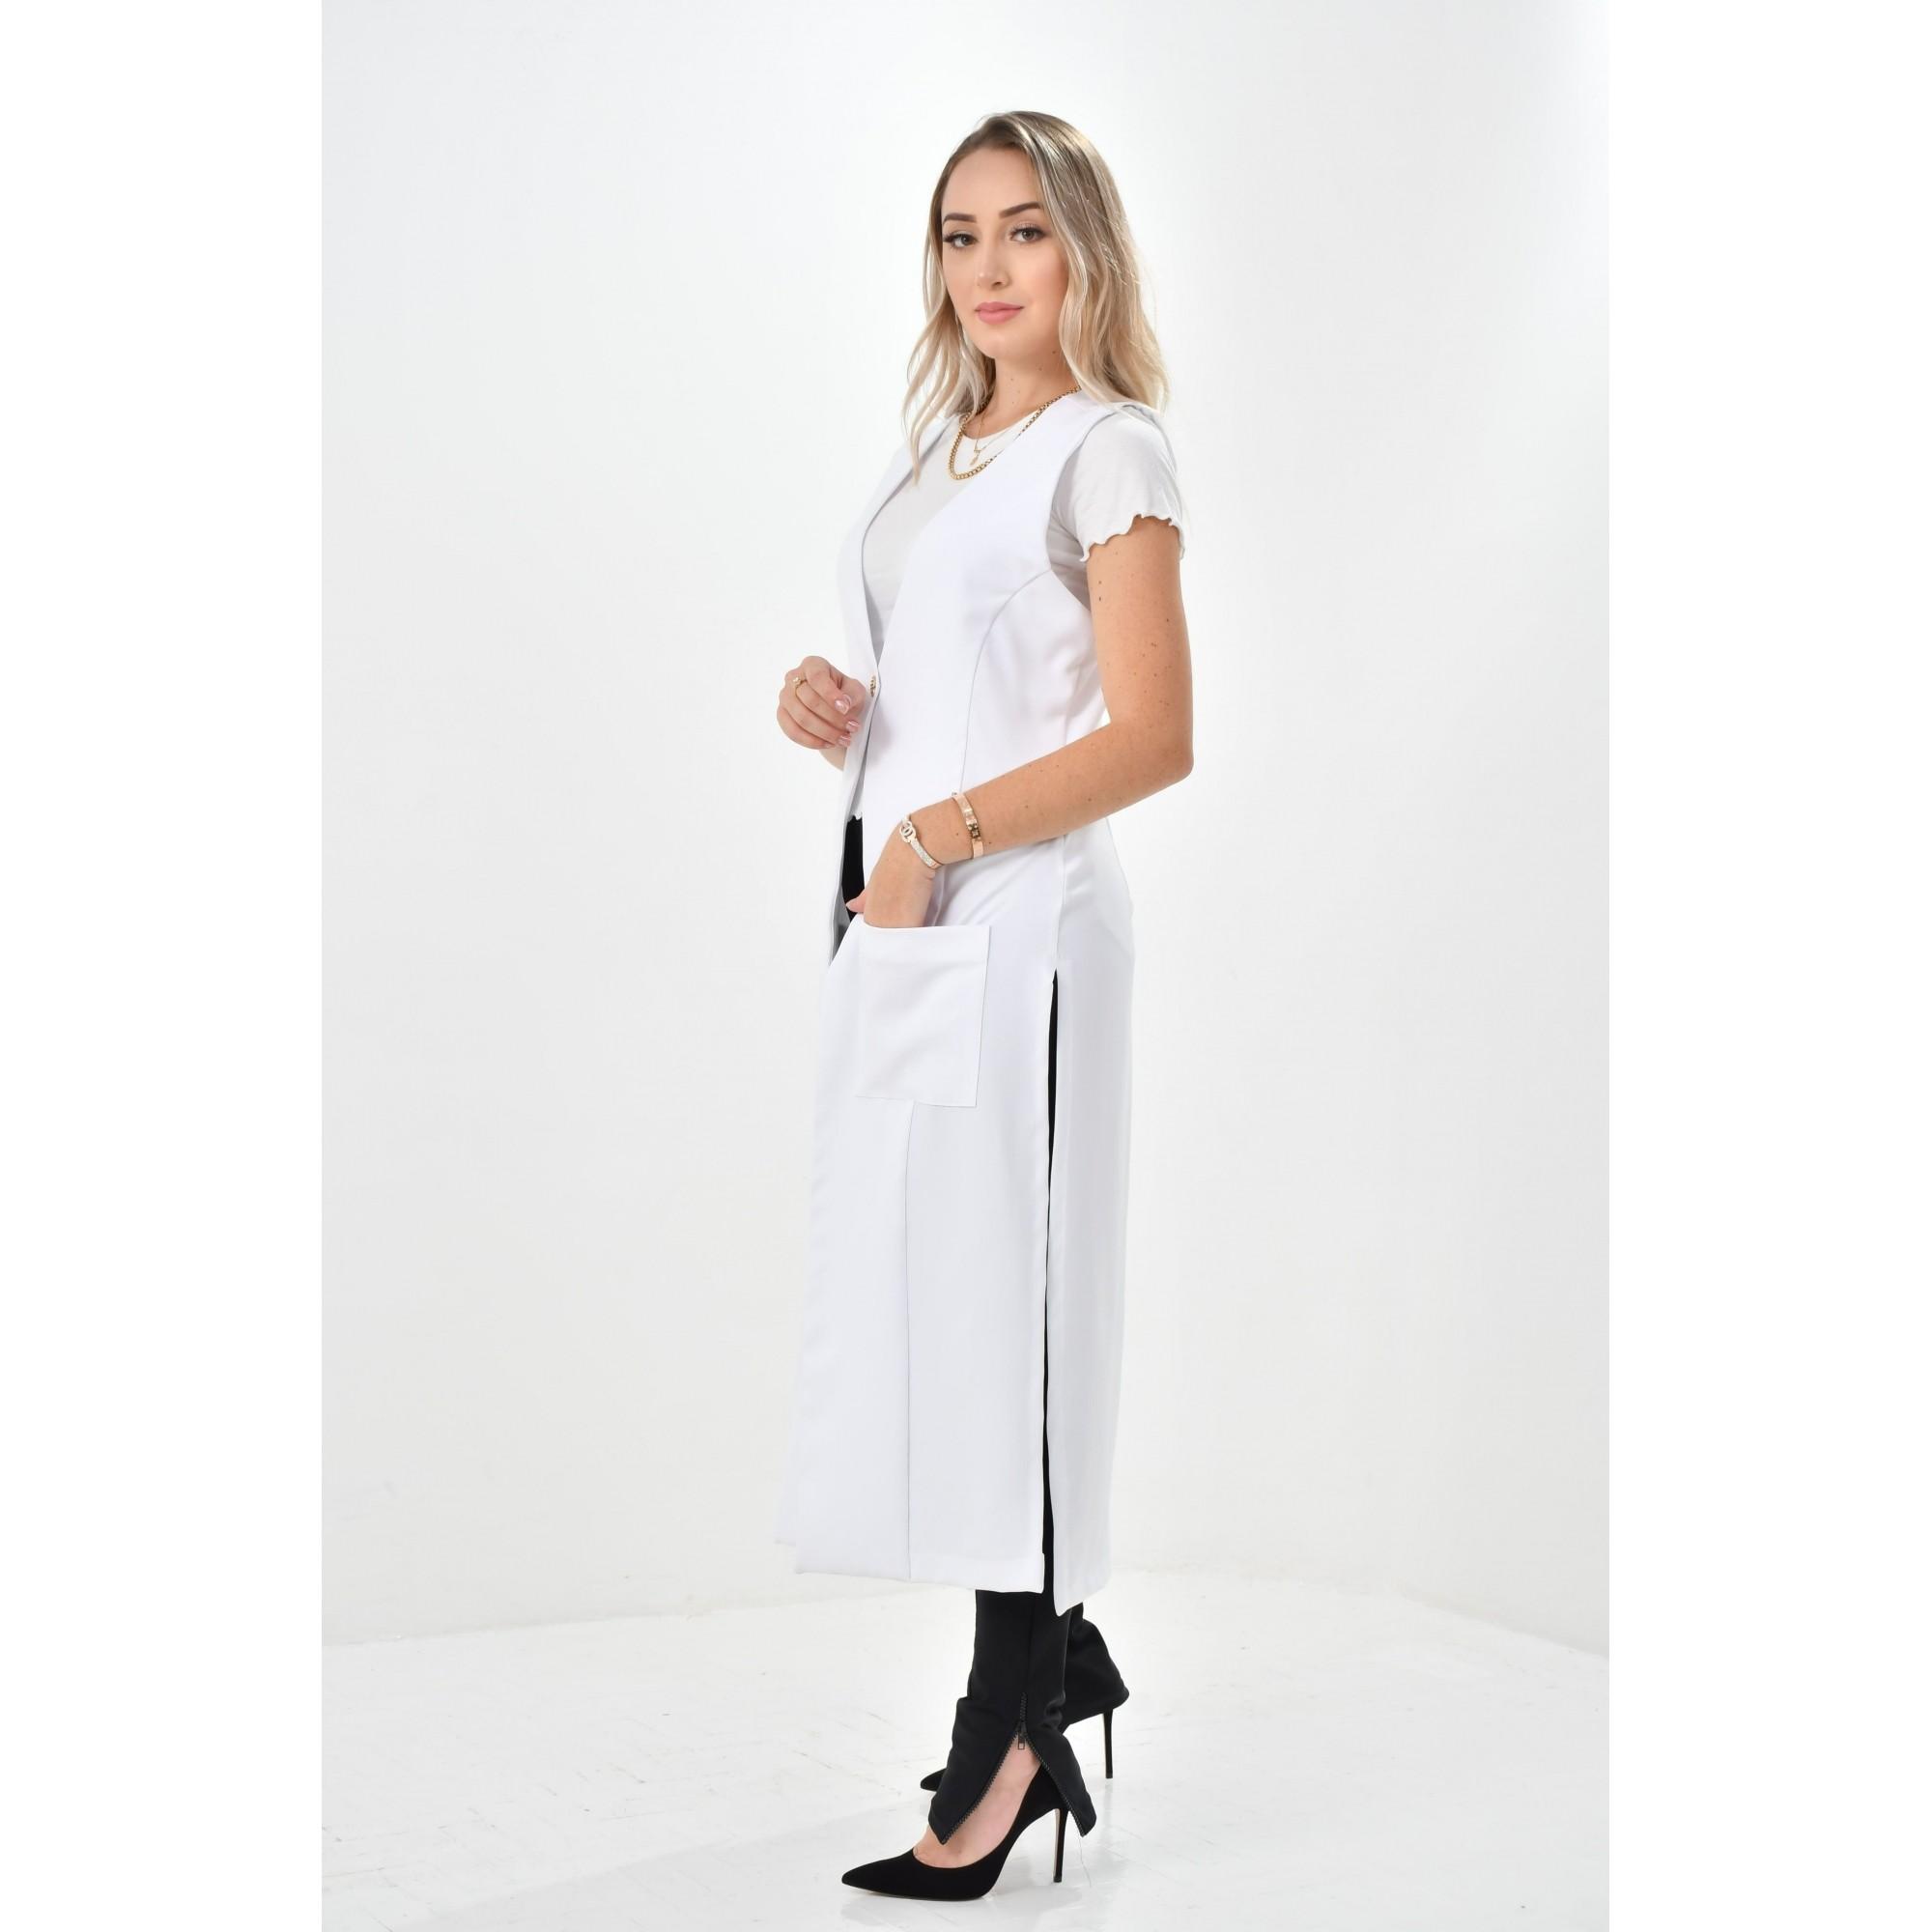 Jaleco Arlete  - Luxo Branco - Jalecos Personalizado Feminino